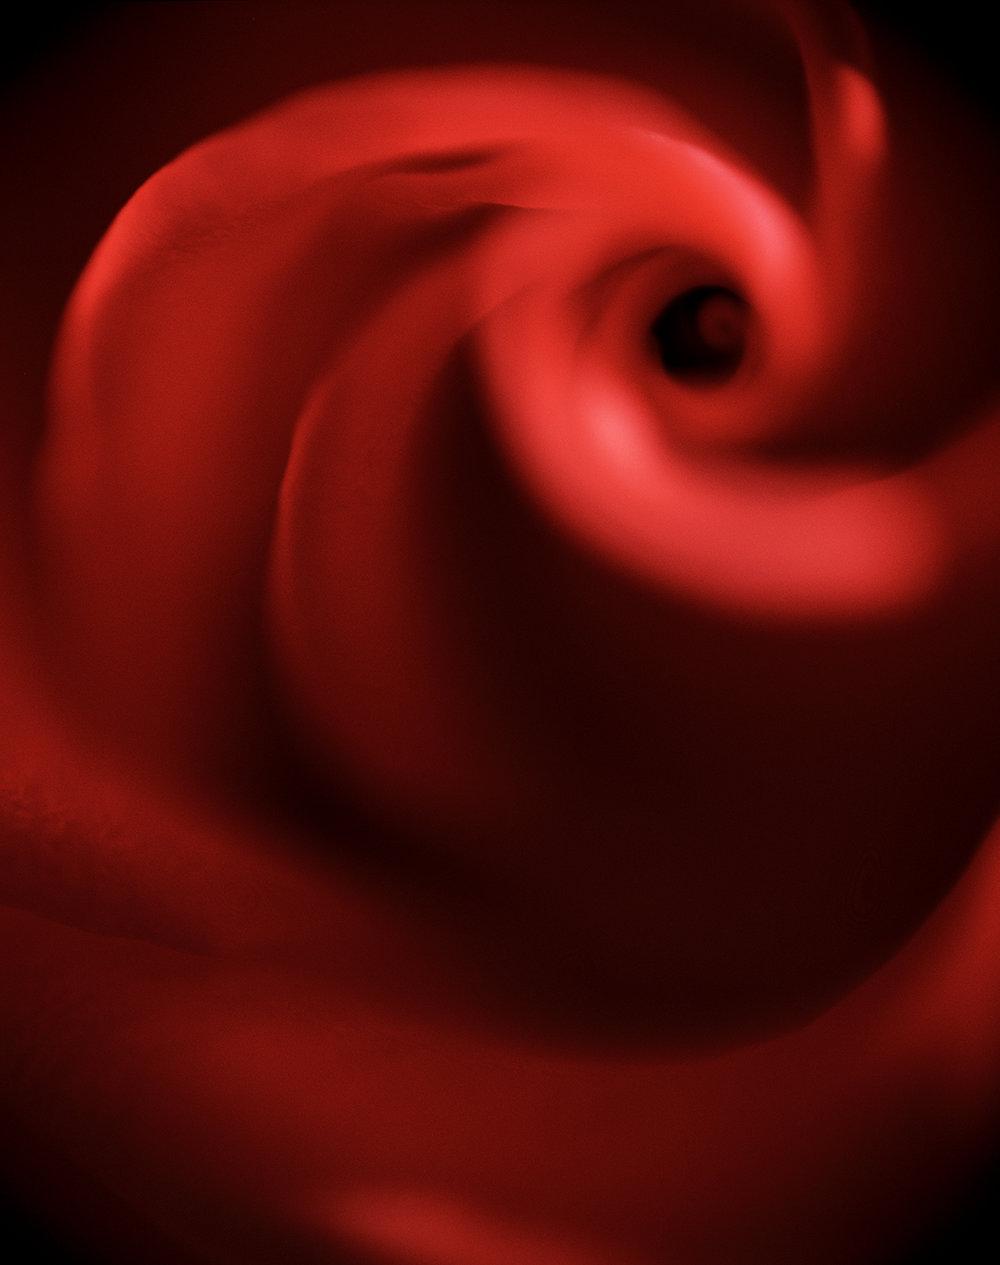 rose swirl.jpg